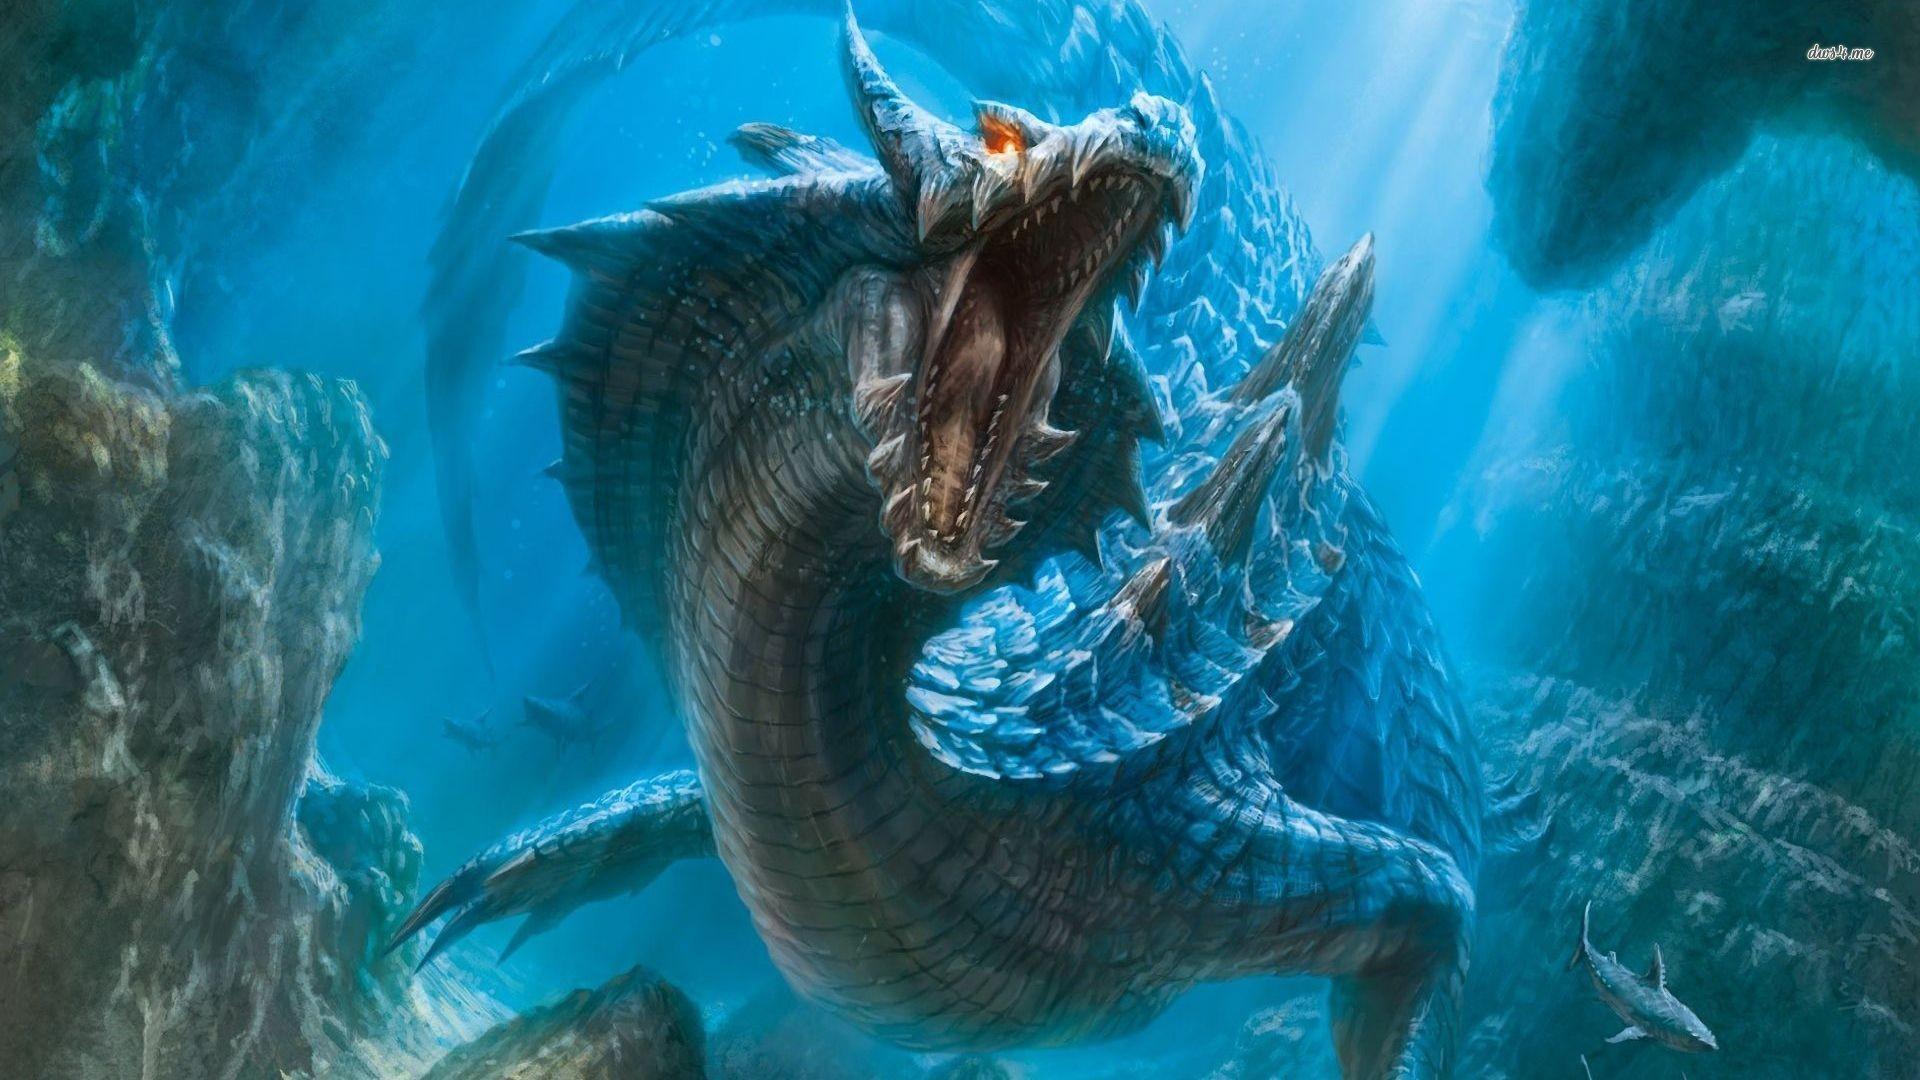 Sea dragon wallpaper Japanese Dragon Shark